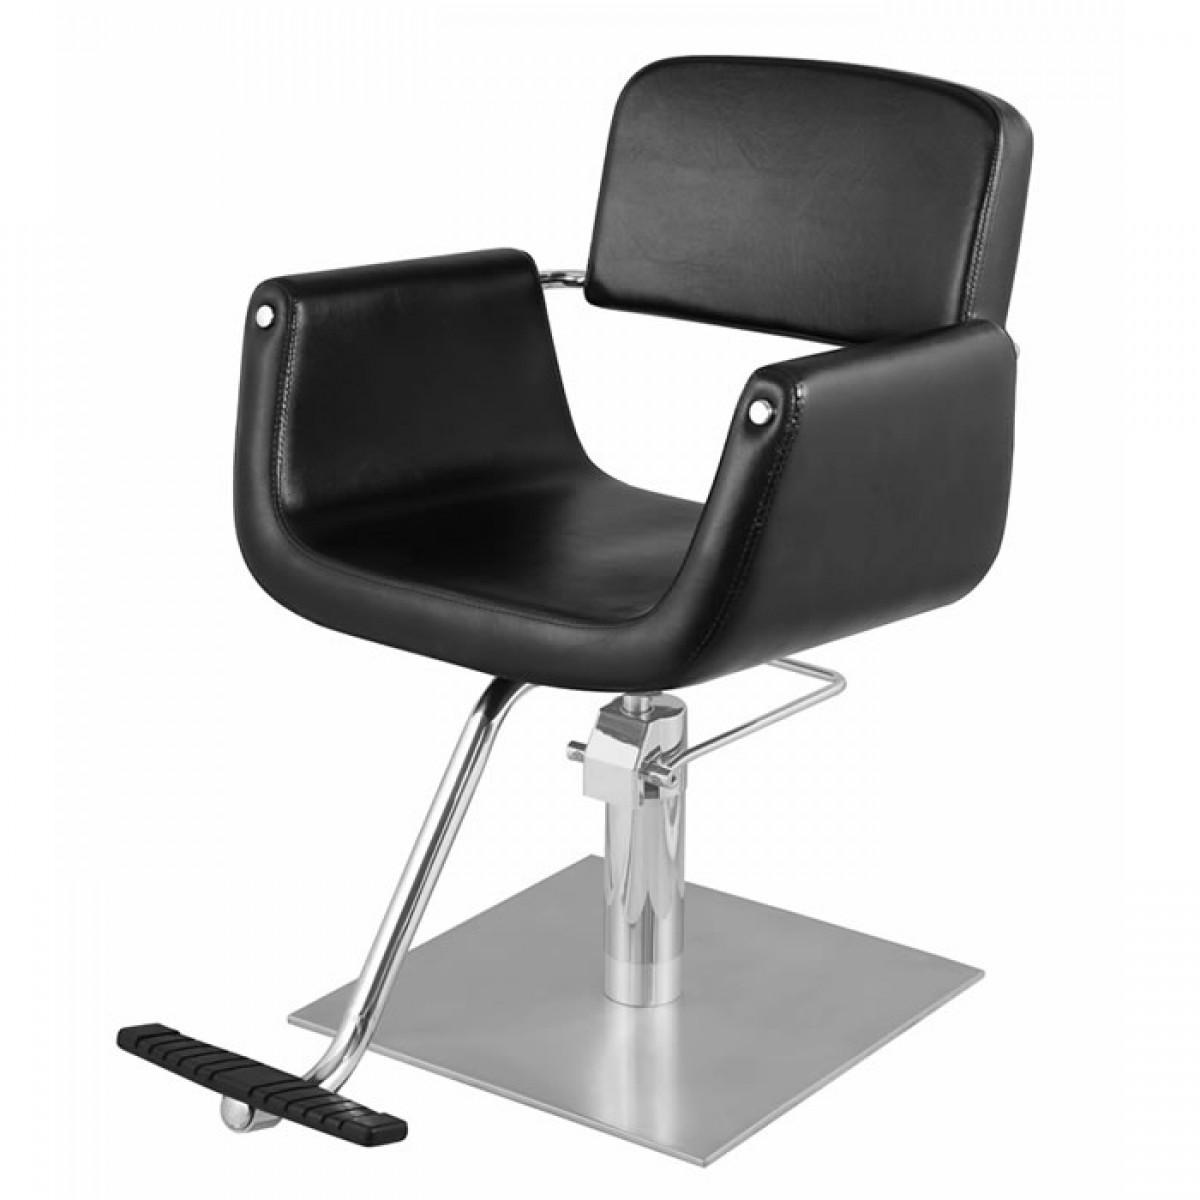 """PALLADIO"" Salon Styling Chair"